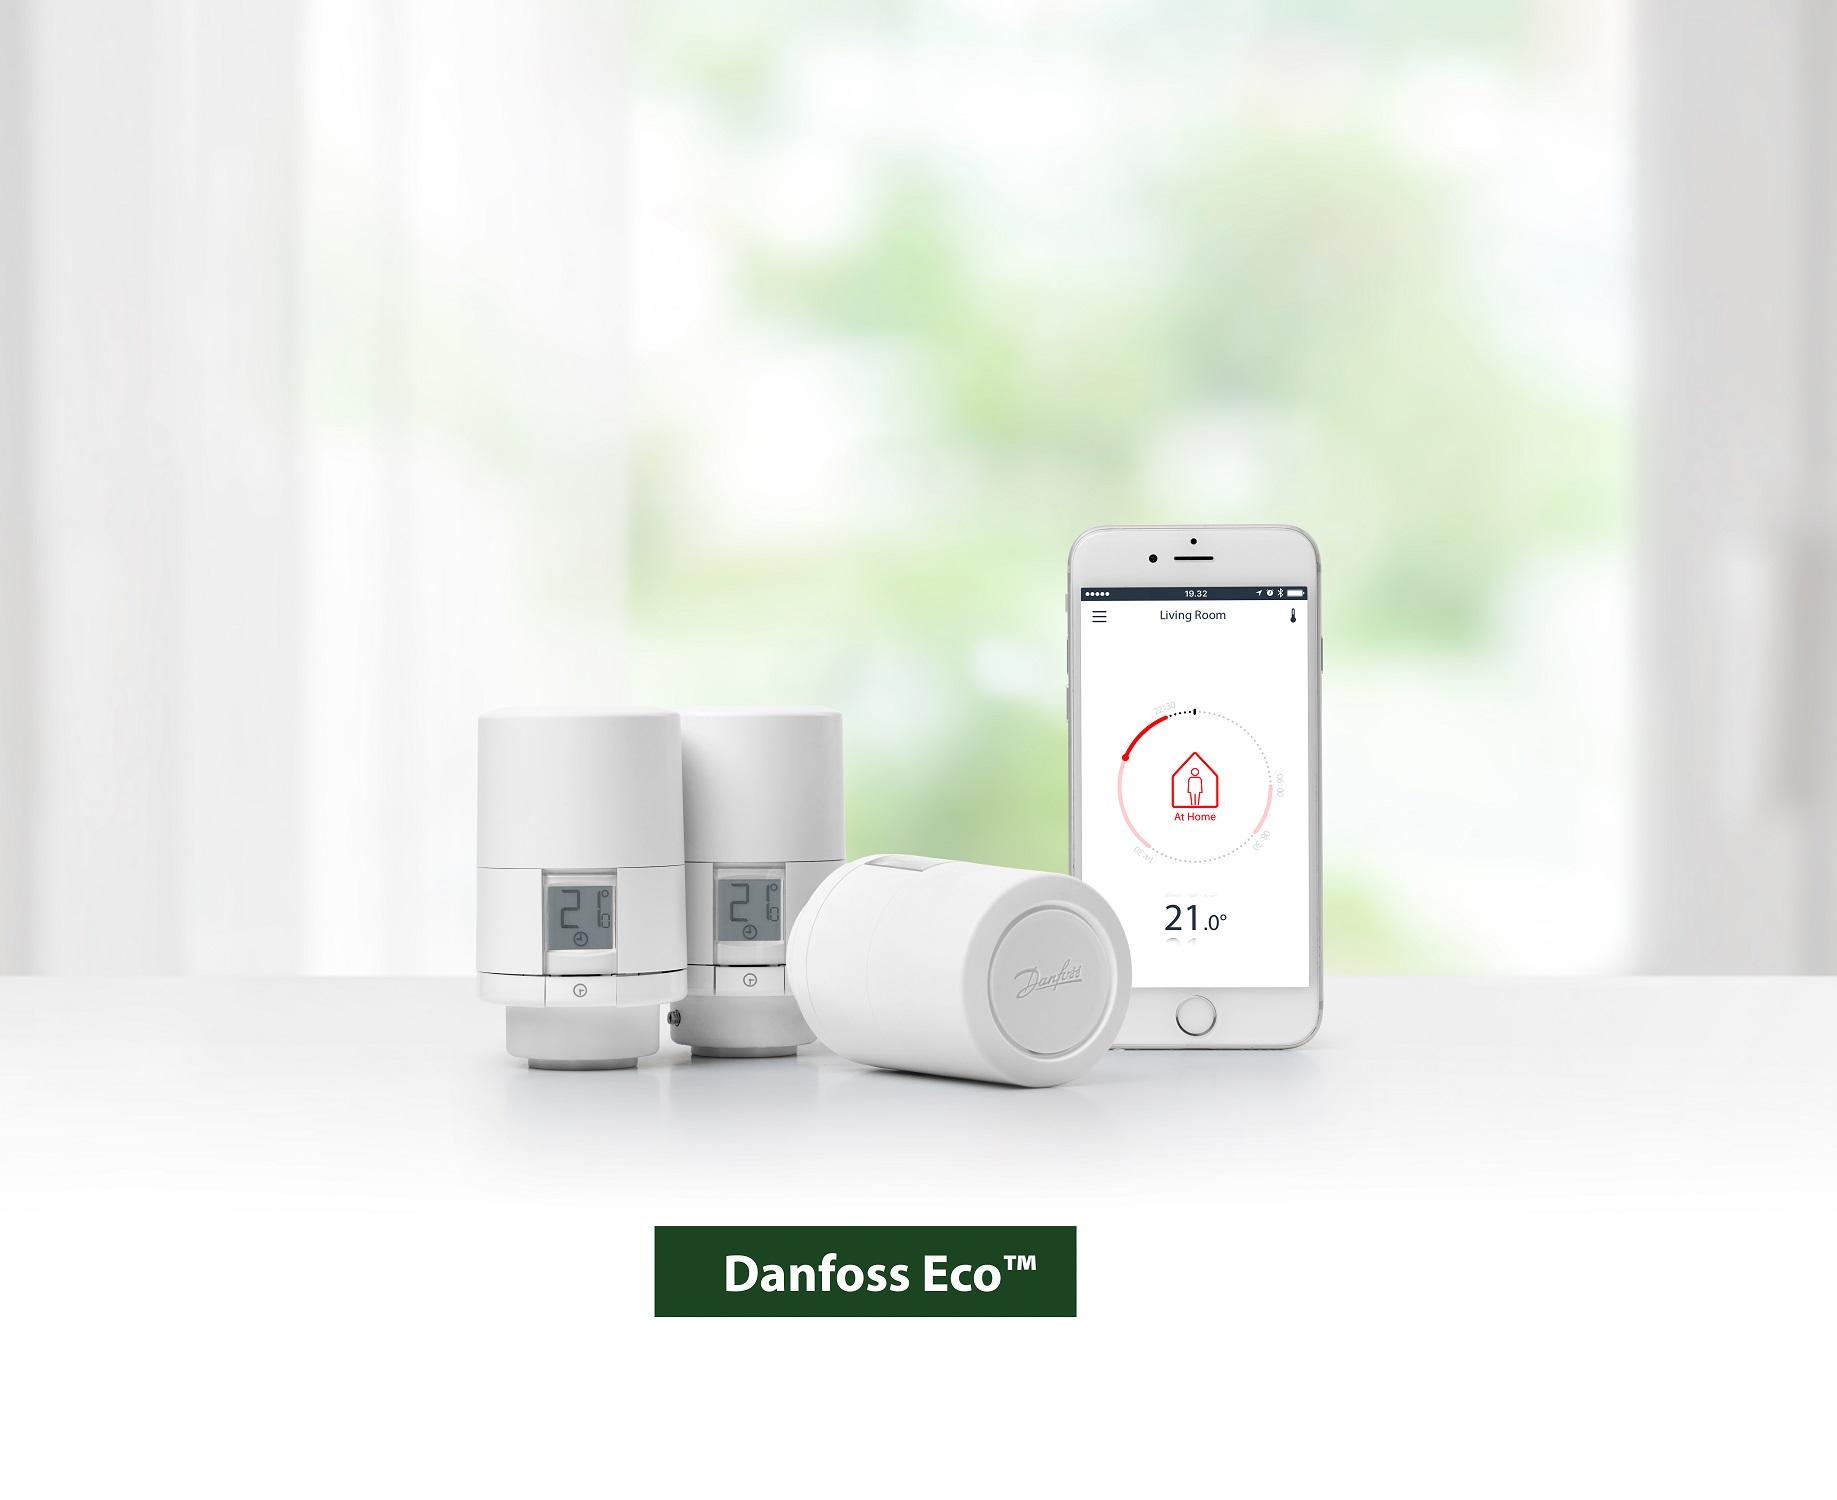 Termostat Danfoss Eco